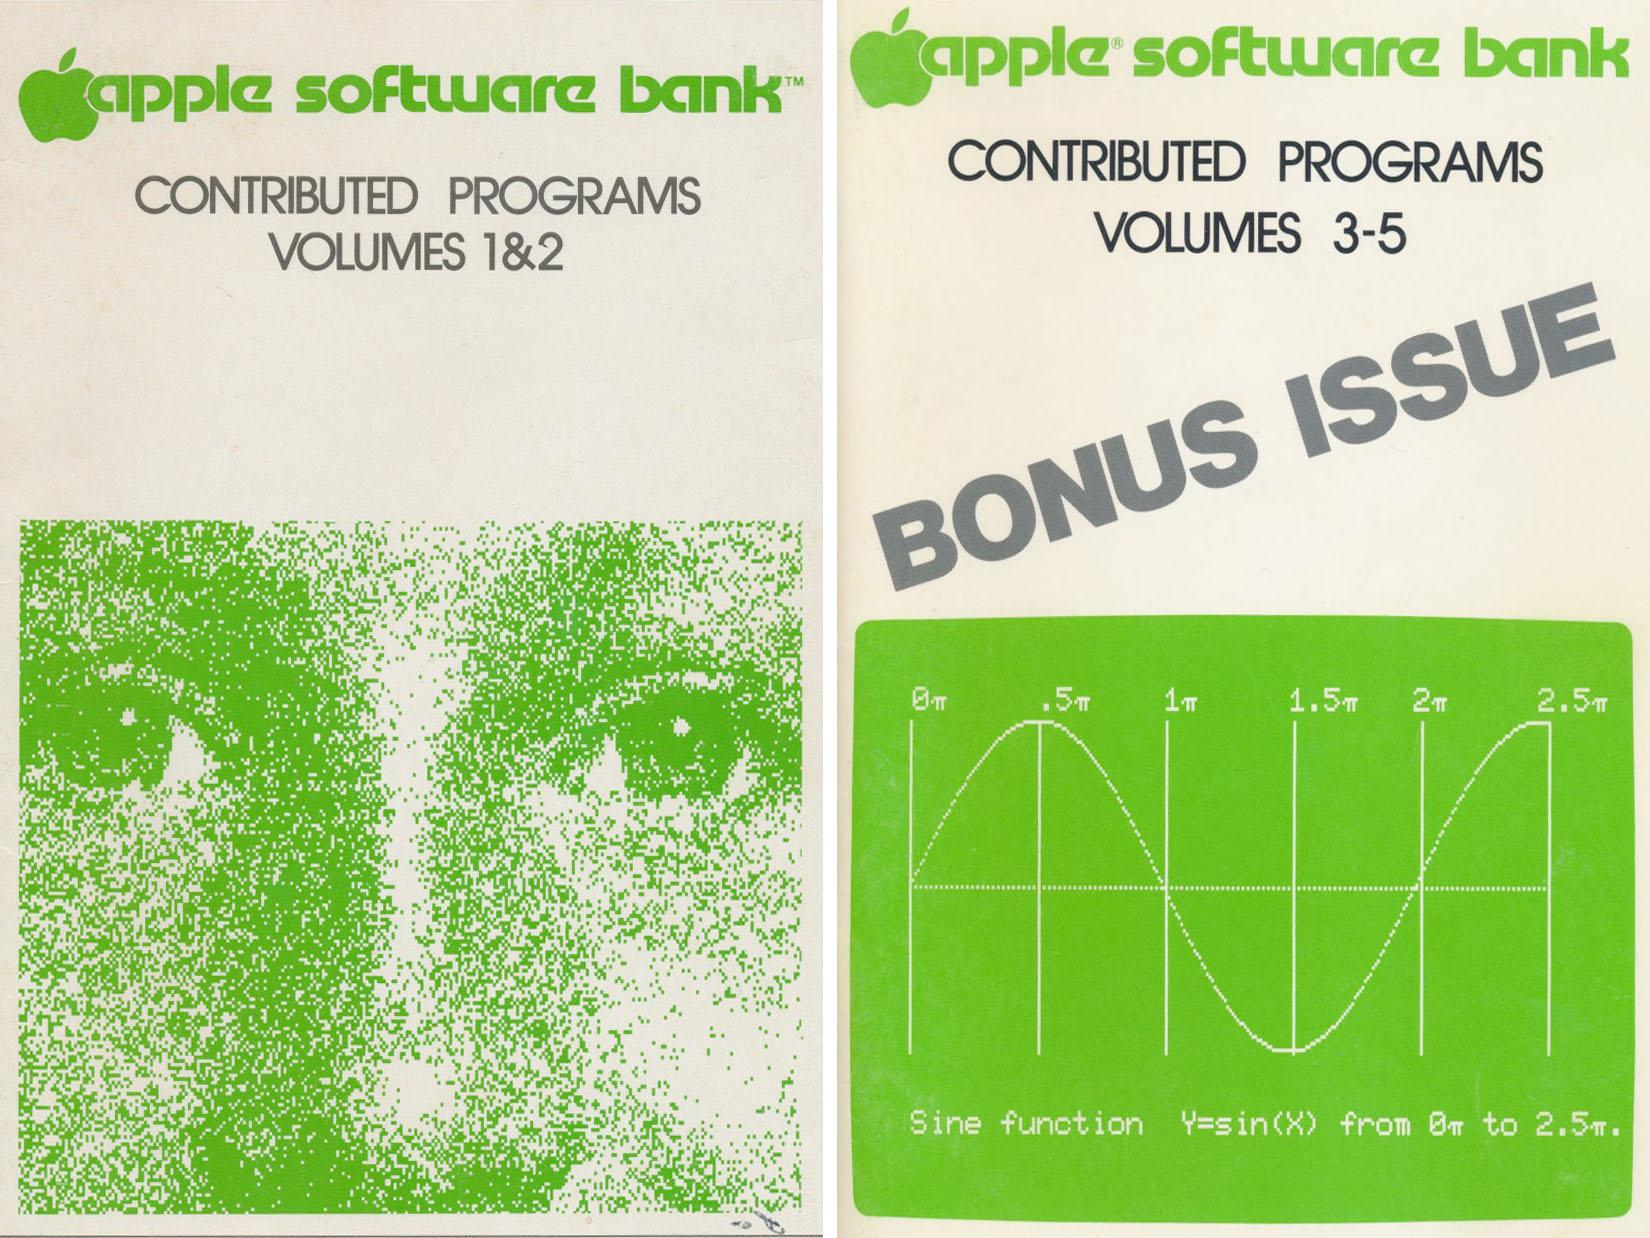 Visicalc Spreadsheet Software Apple software bank, volumes